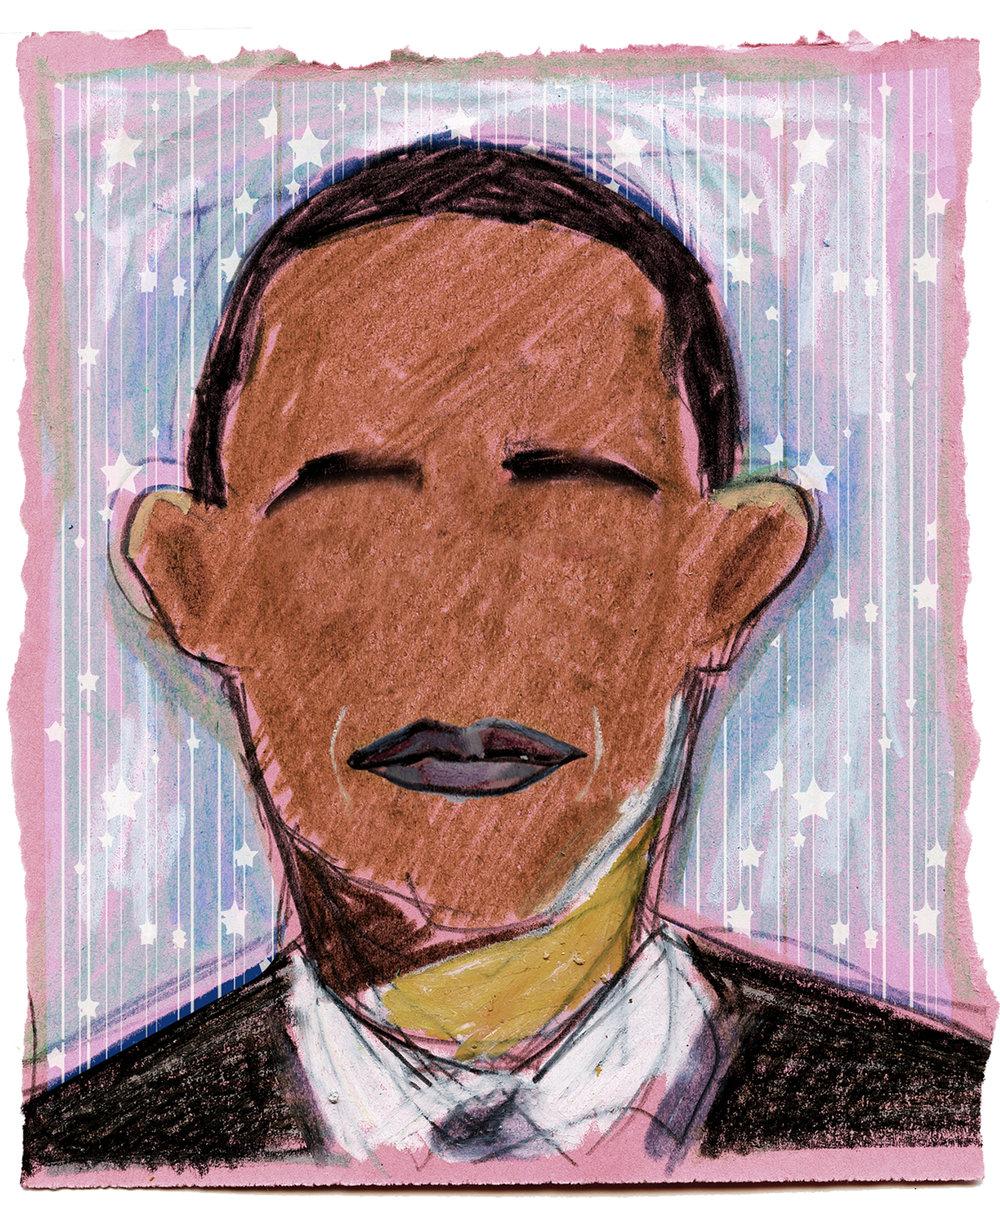 Obama2 copy.jpg